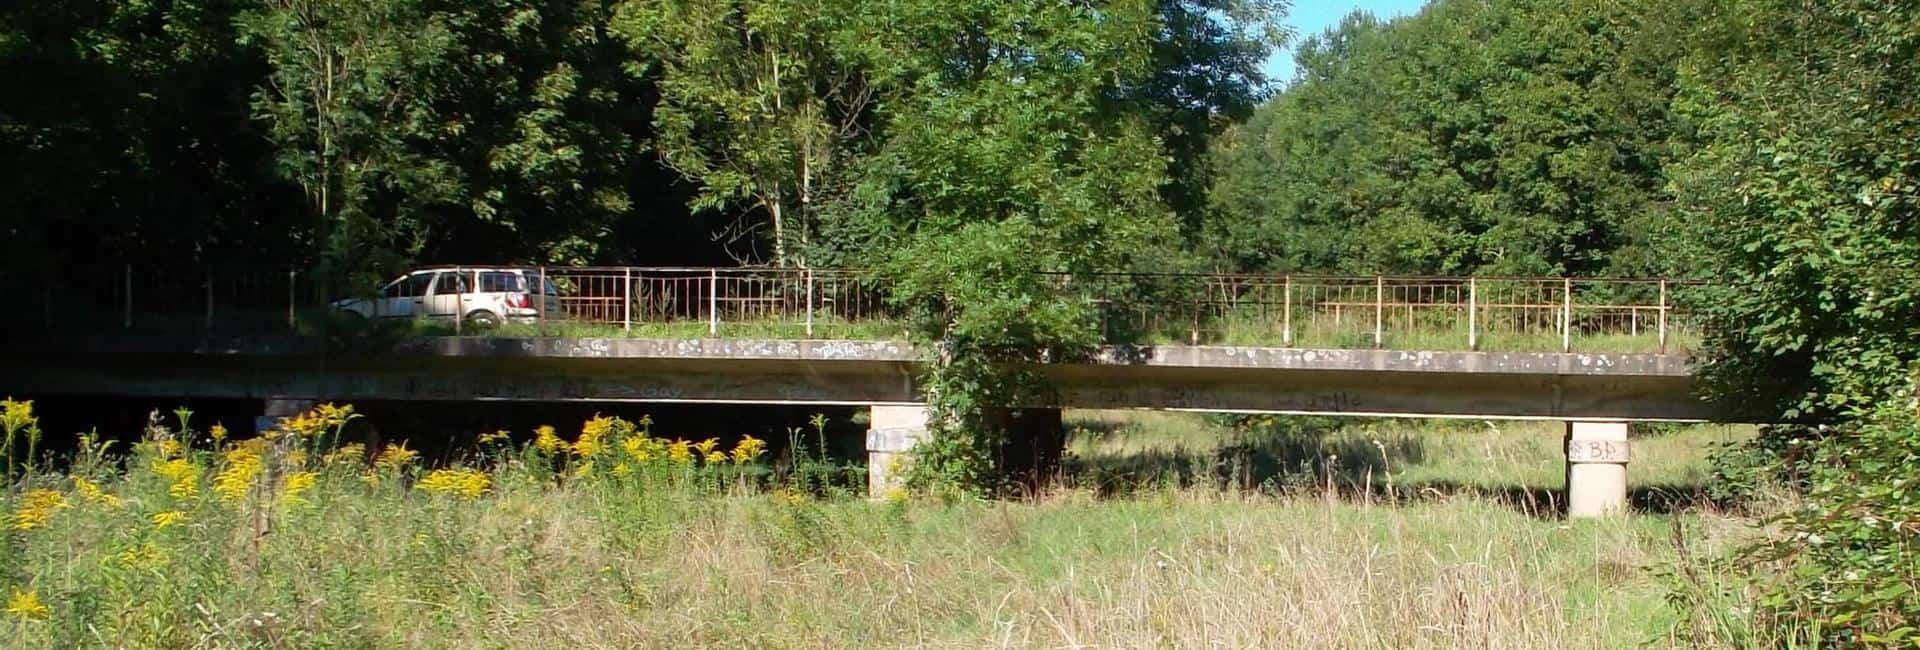 Brücke im Bereich Flutmulde